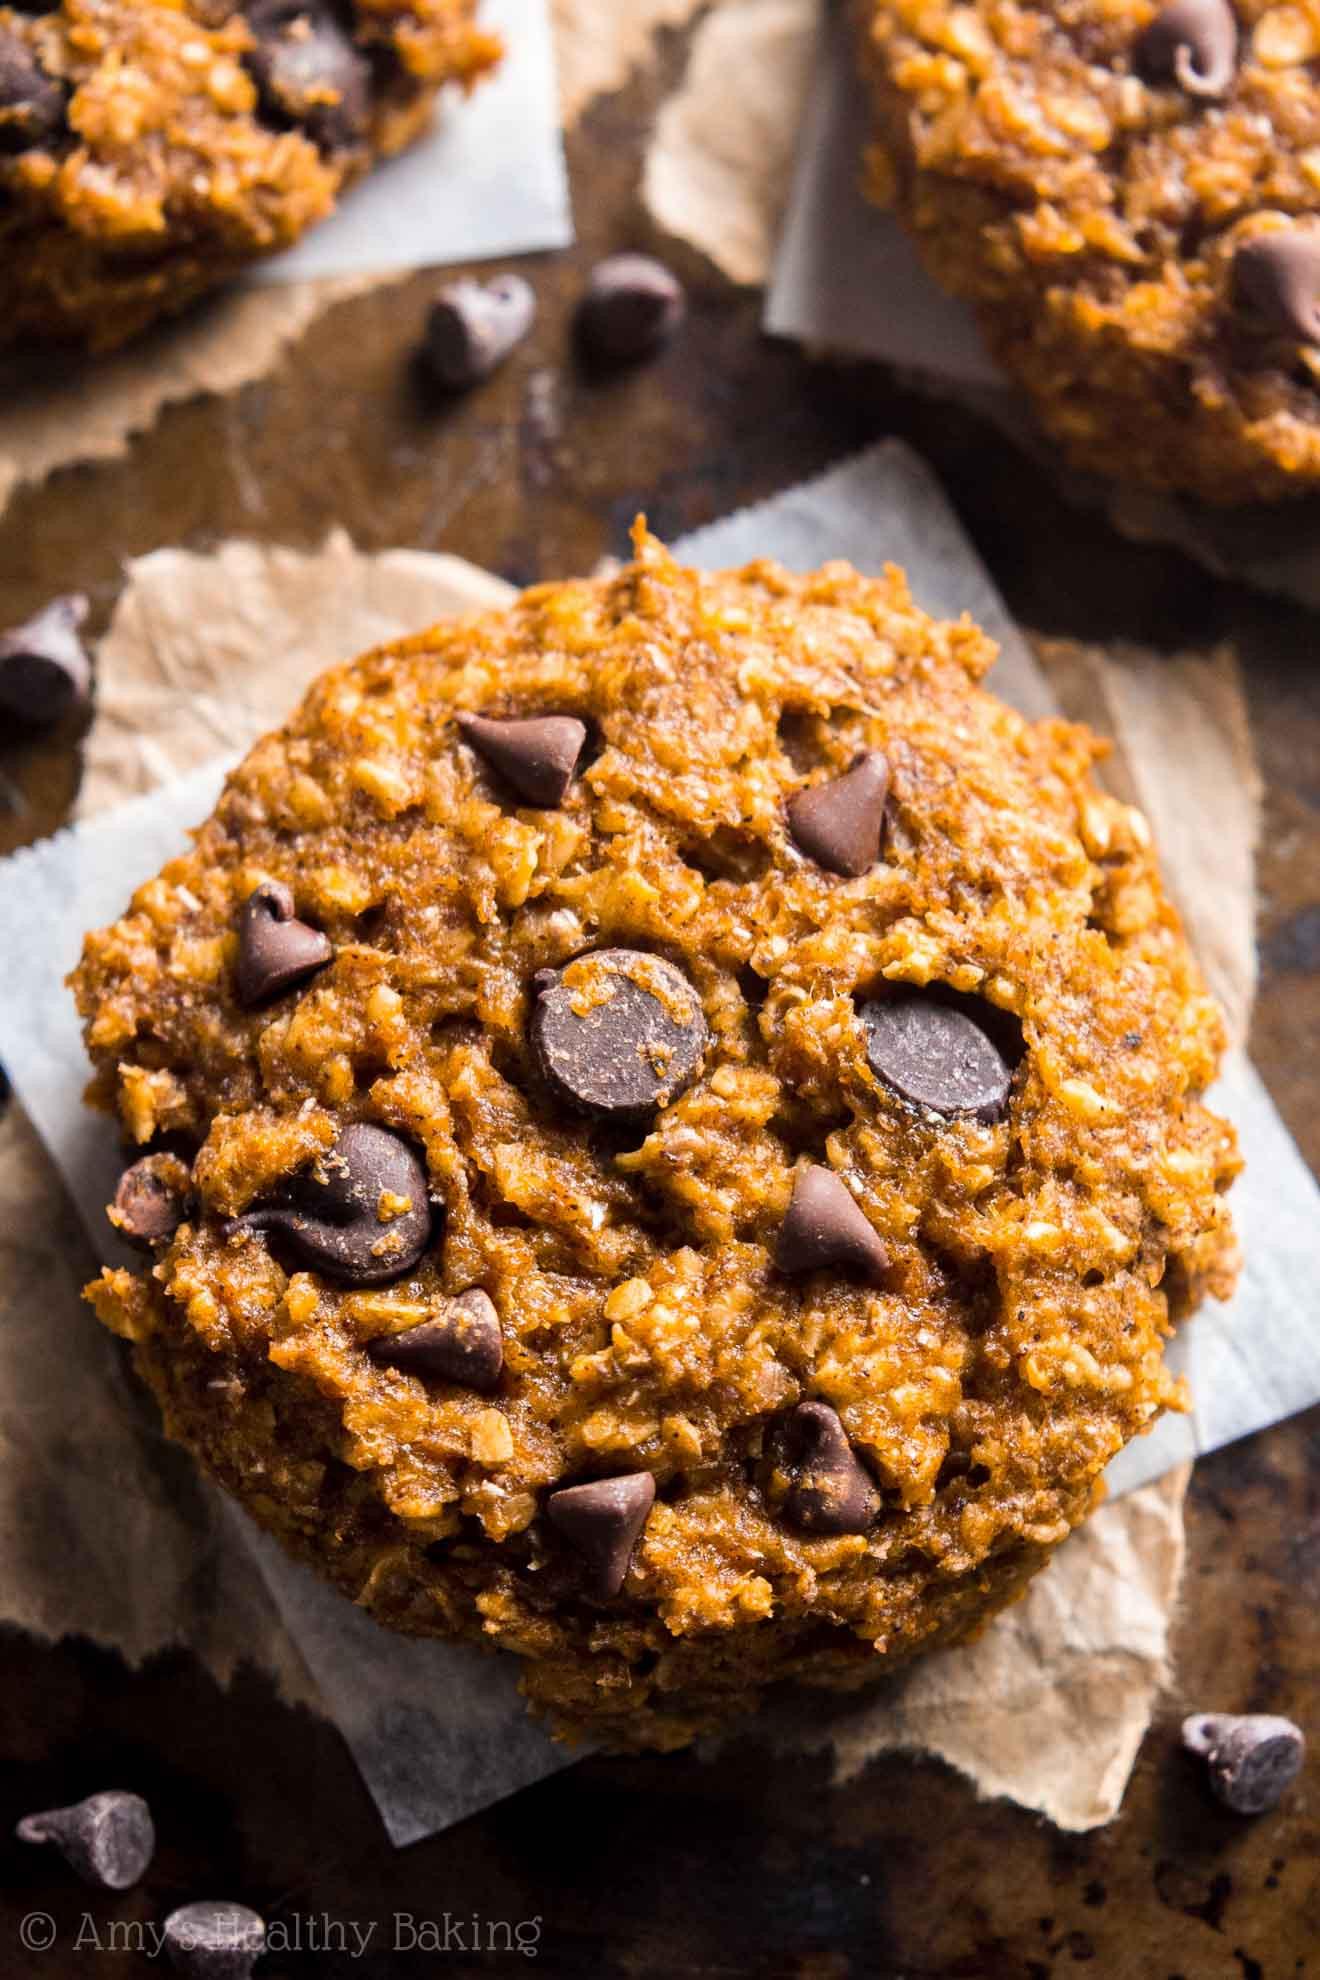 Healthy Chocolate Chip Oatmeal Cookies  Pumpkin Pie Chocolate Chip Oatmeal Cookies Recipe Video